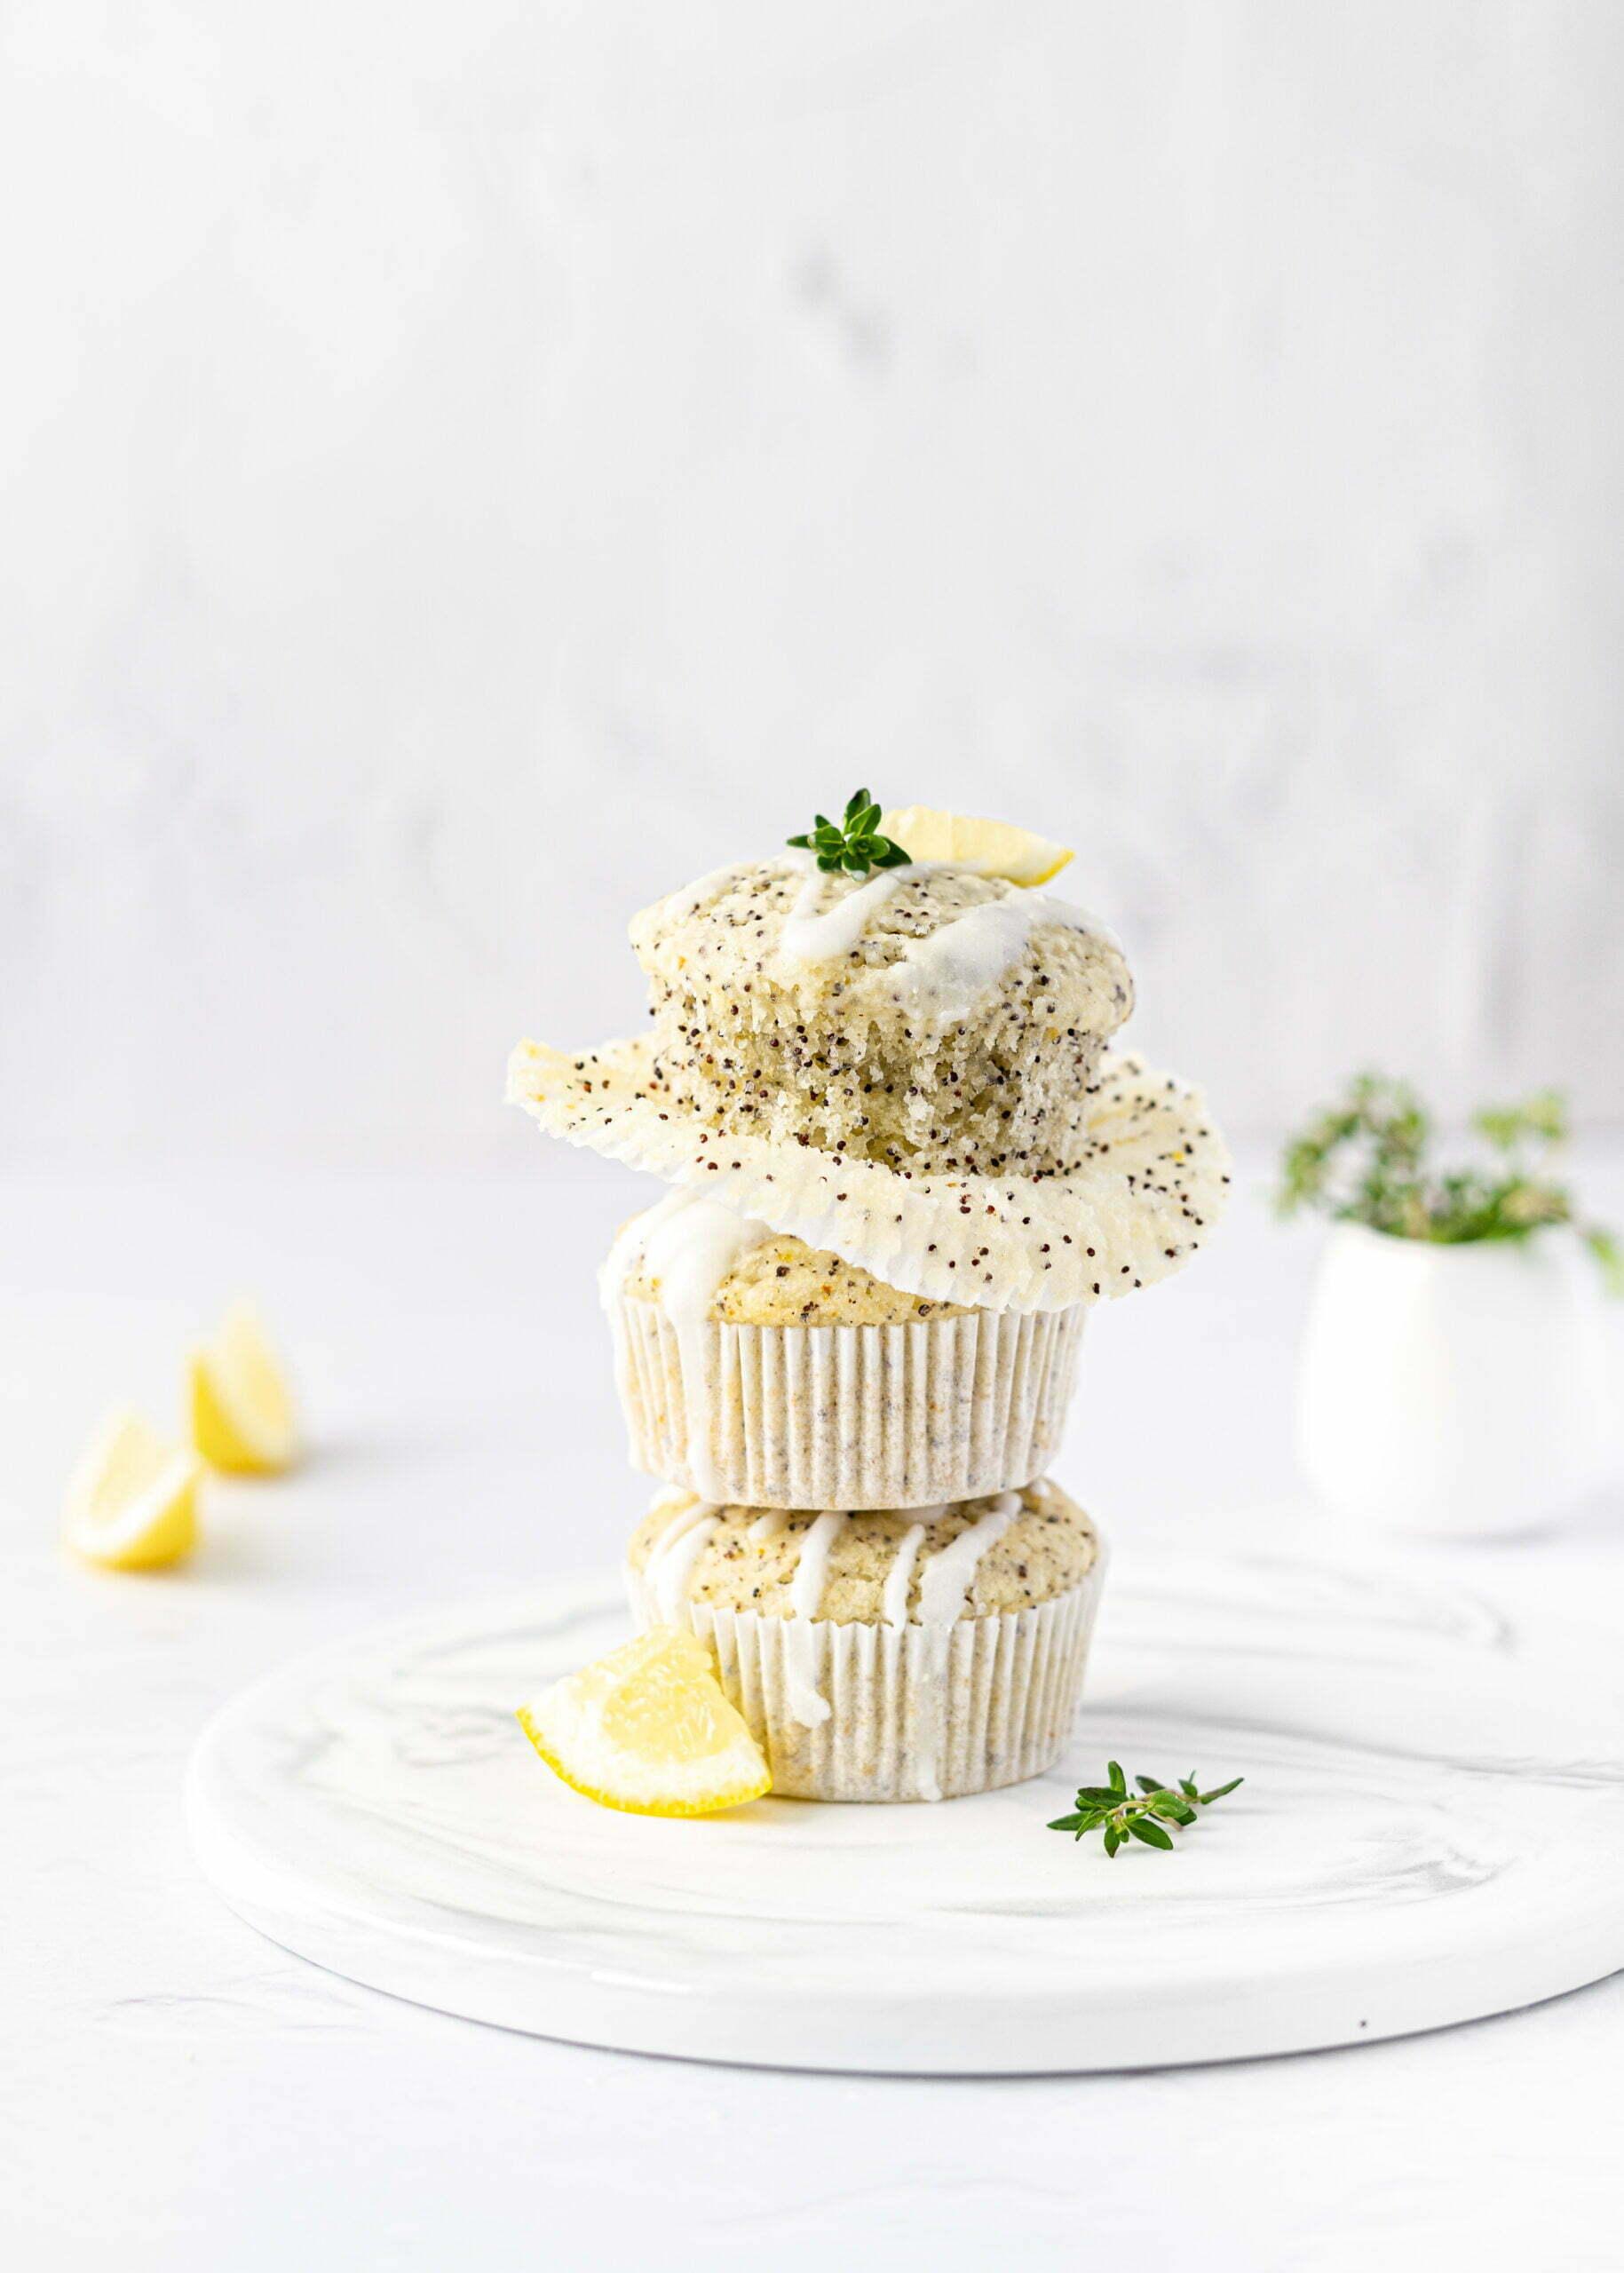 Brezglutenski limonini mafini z makom (brez glutena, veganski)